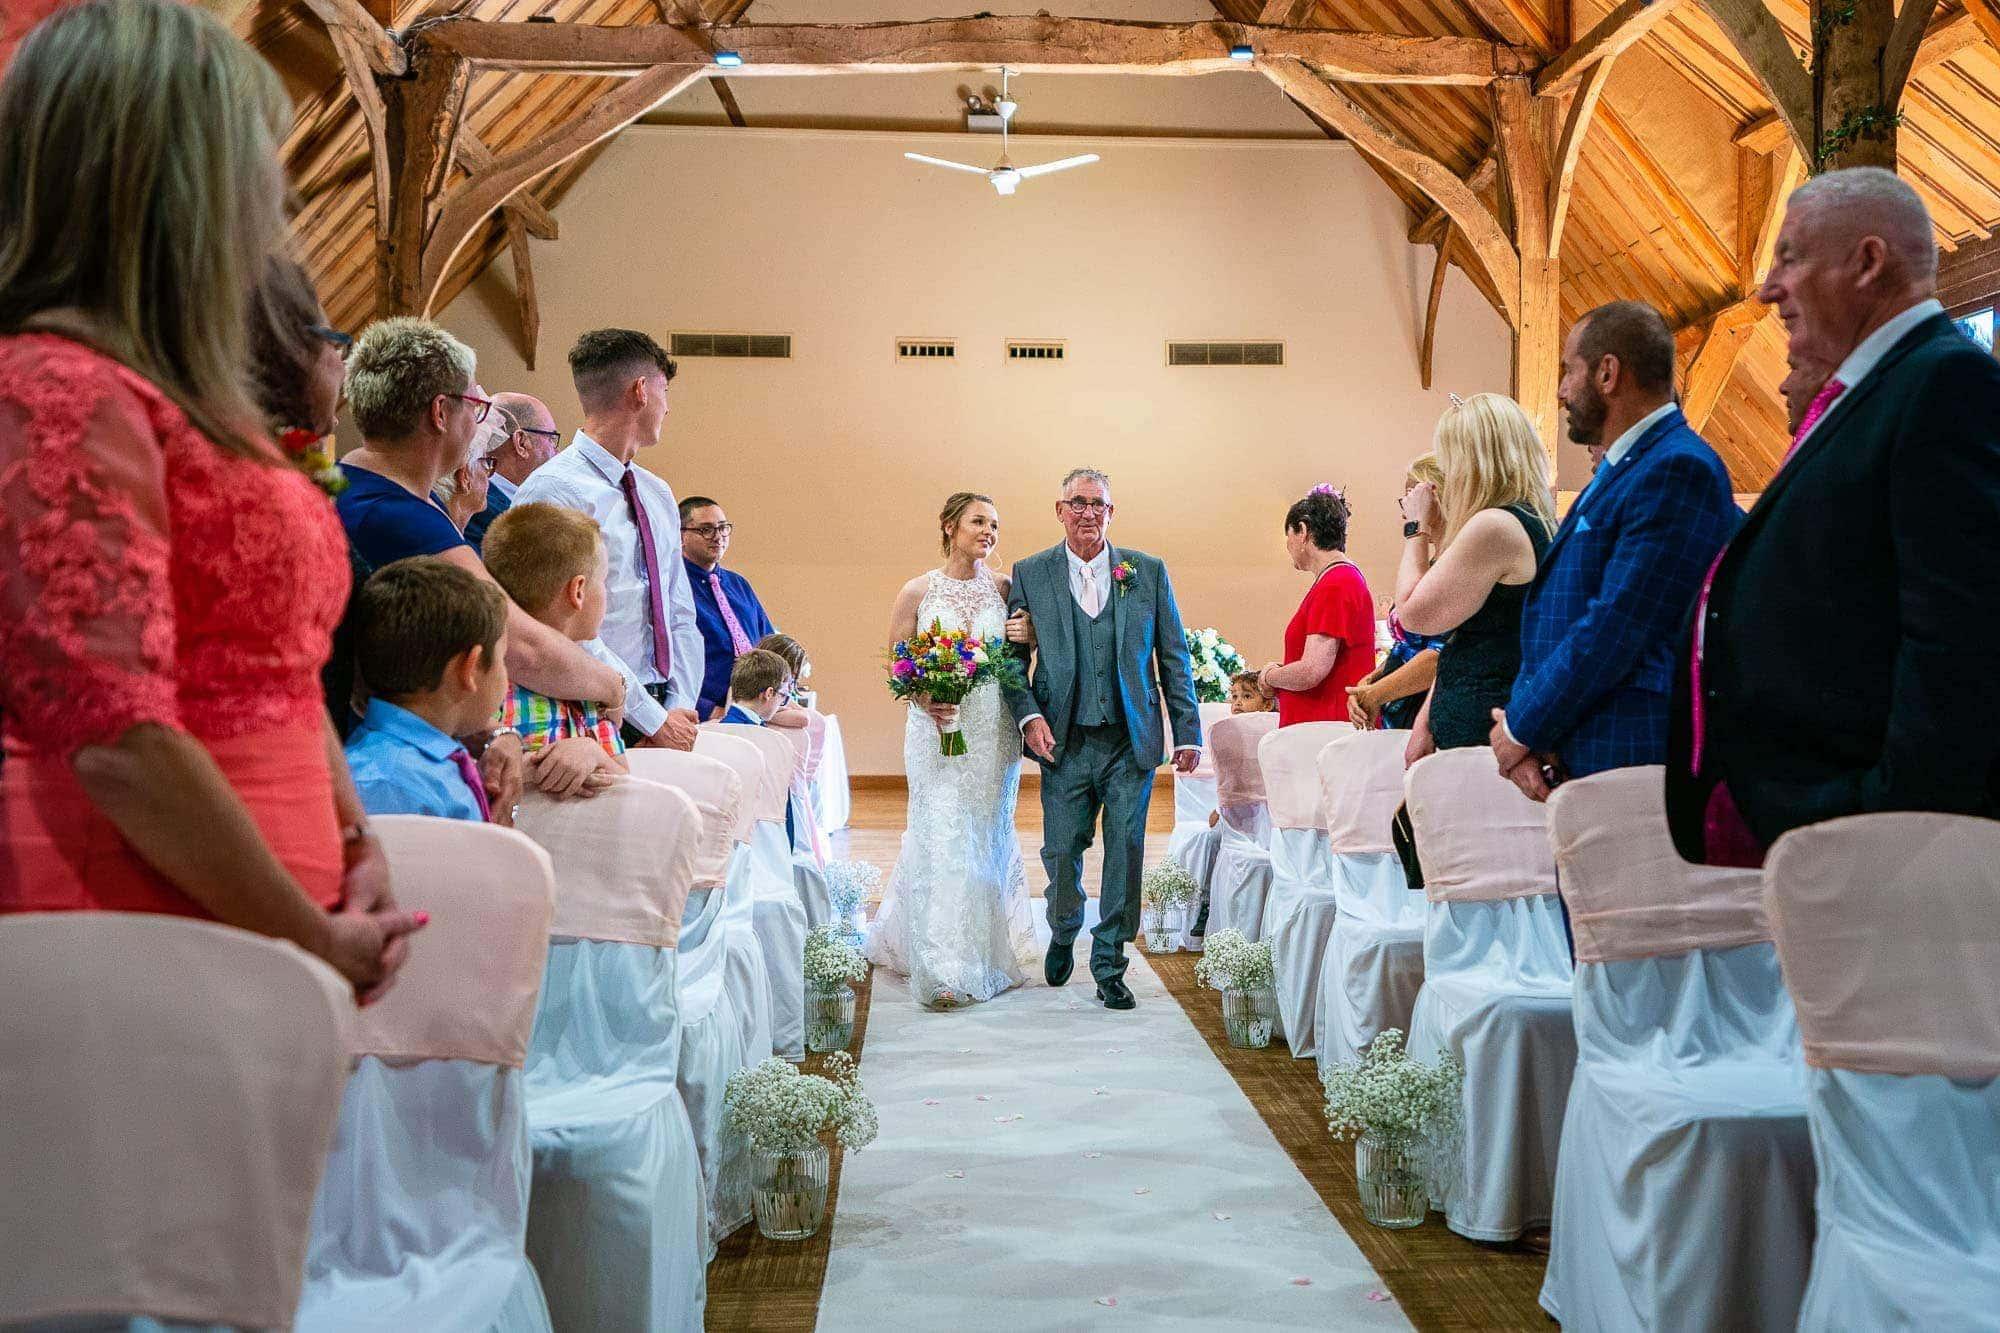 17th century Tythe Barn wedding ceremony at Norton Park Hotel